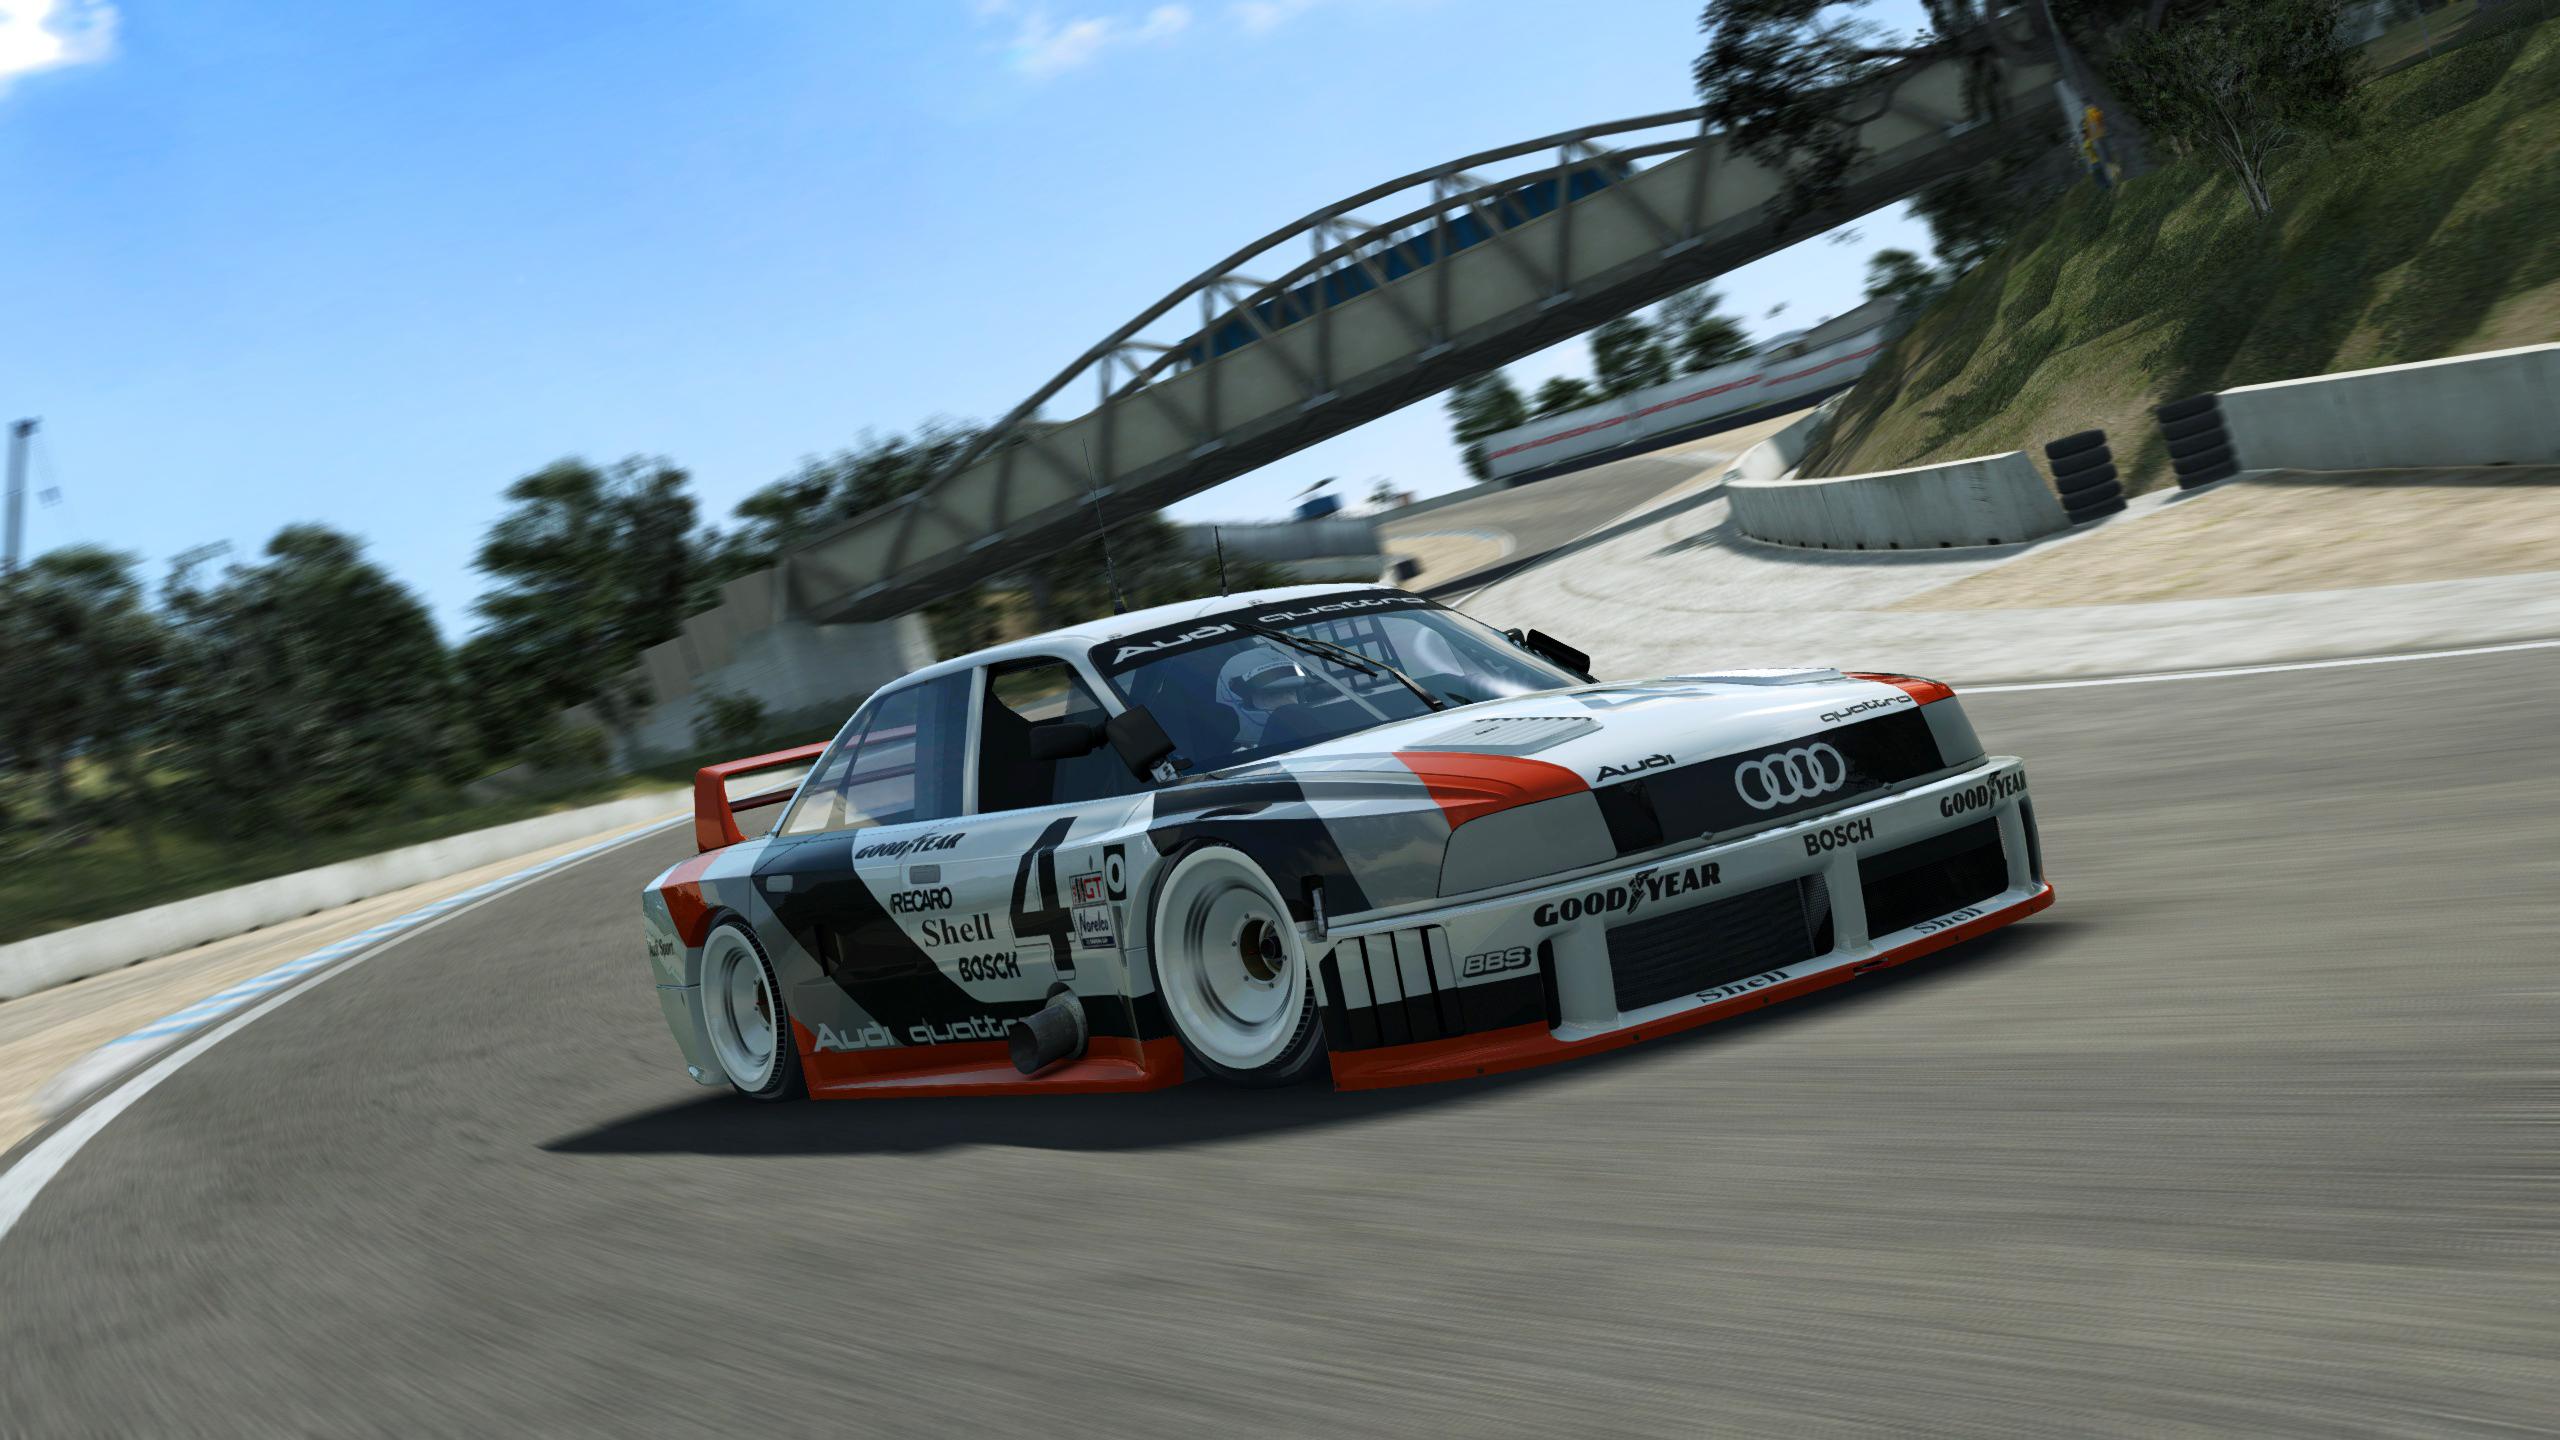 Turbocharged Audi 90 Quattro Imsa Gto Races Onto R3e